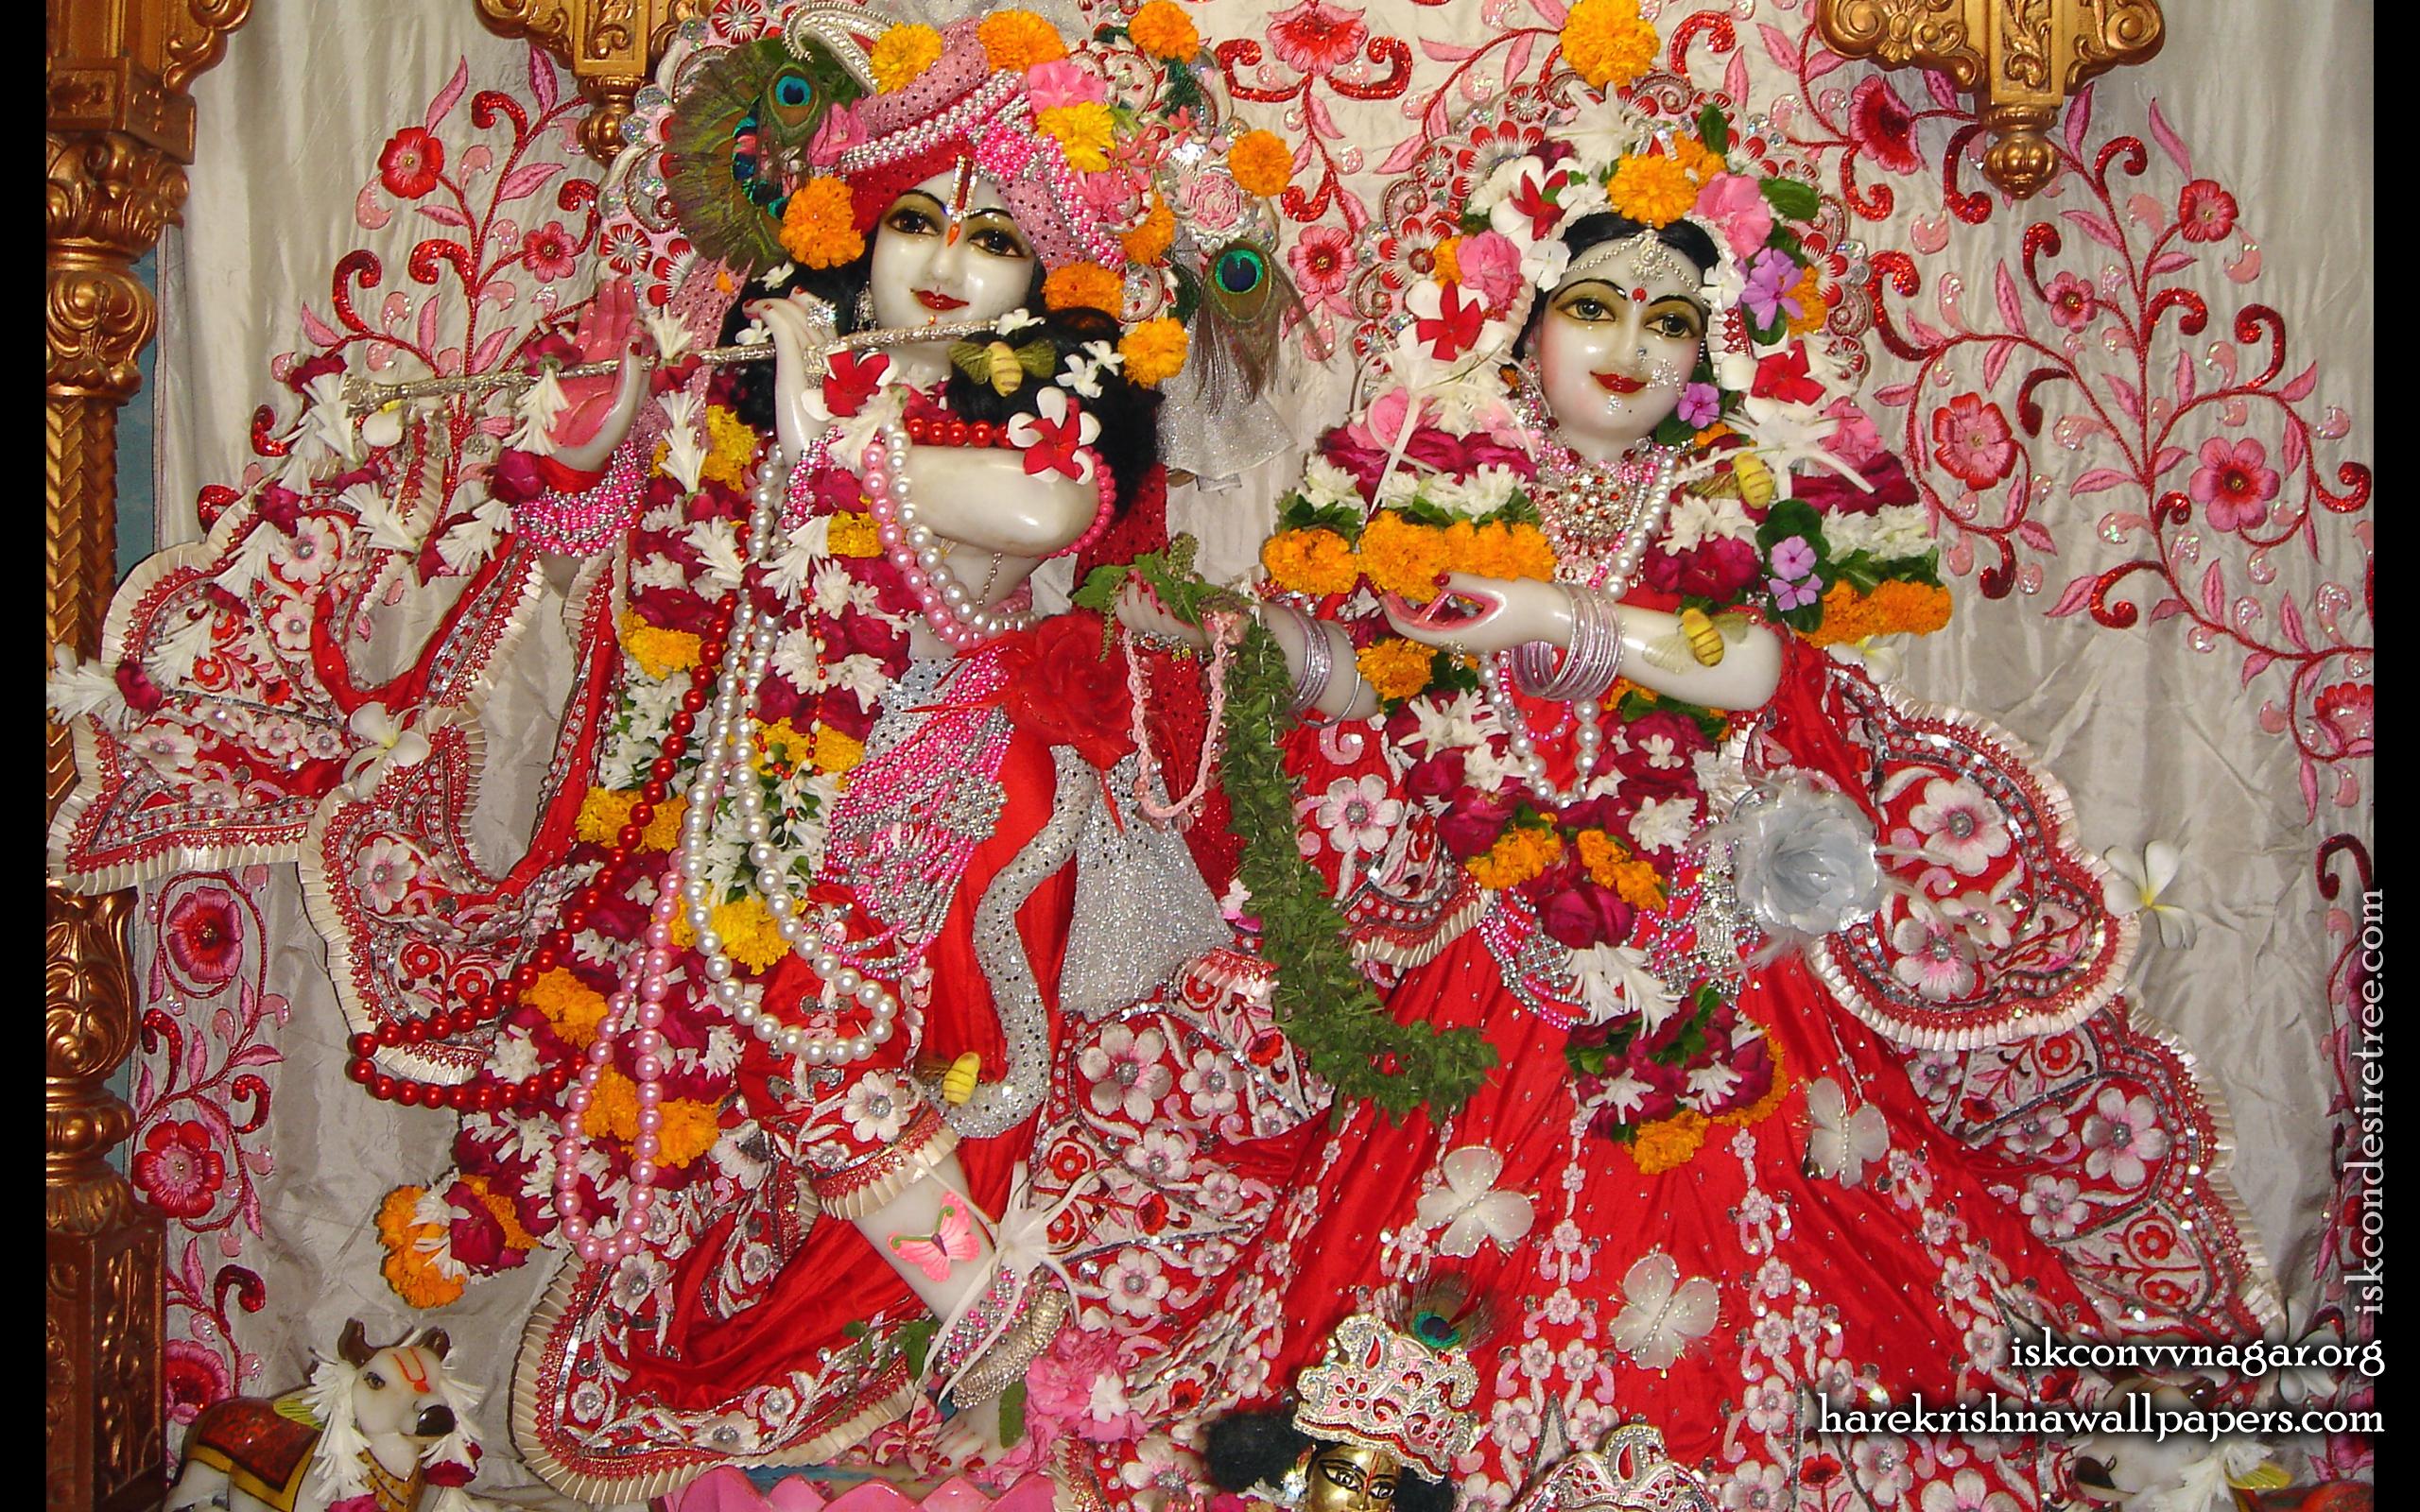 Sri Sri Radha Giridhari Wallpaper (018) Size 2560x1600 Download